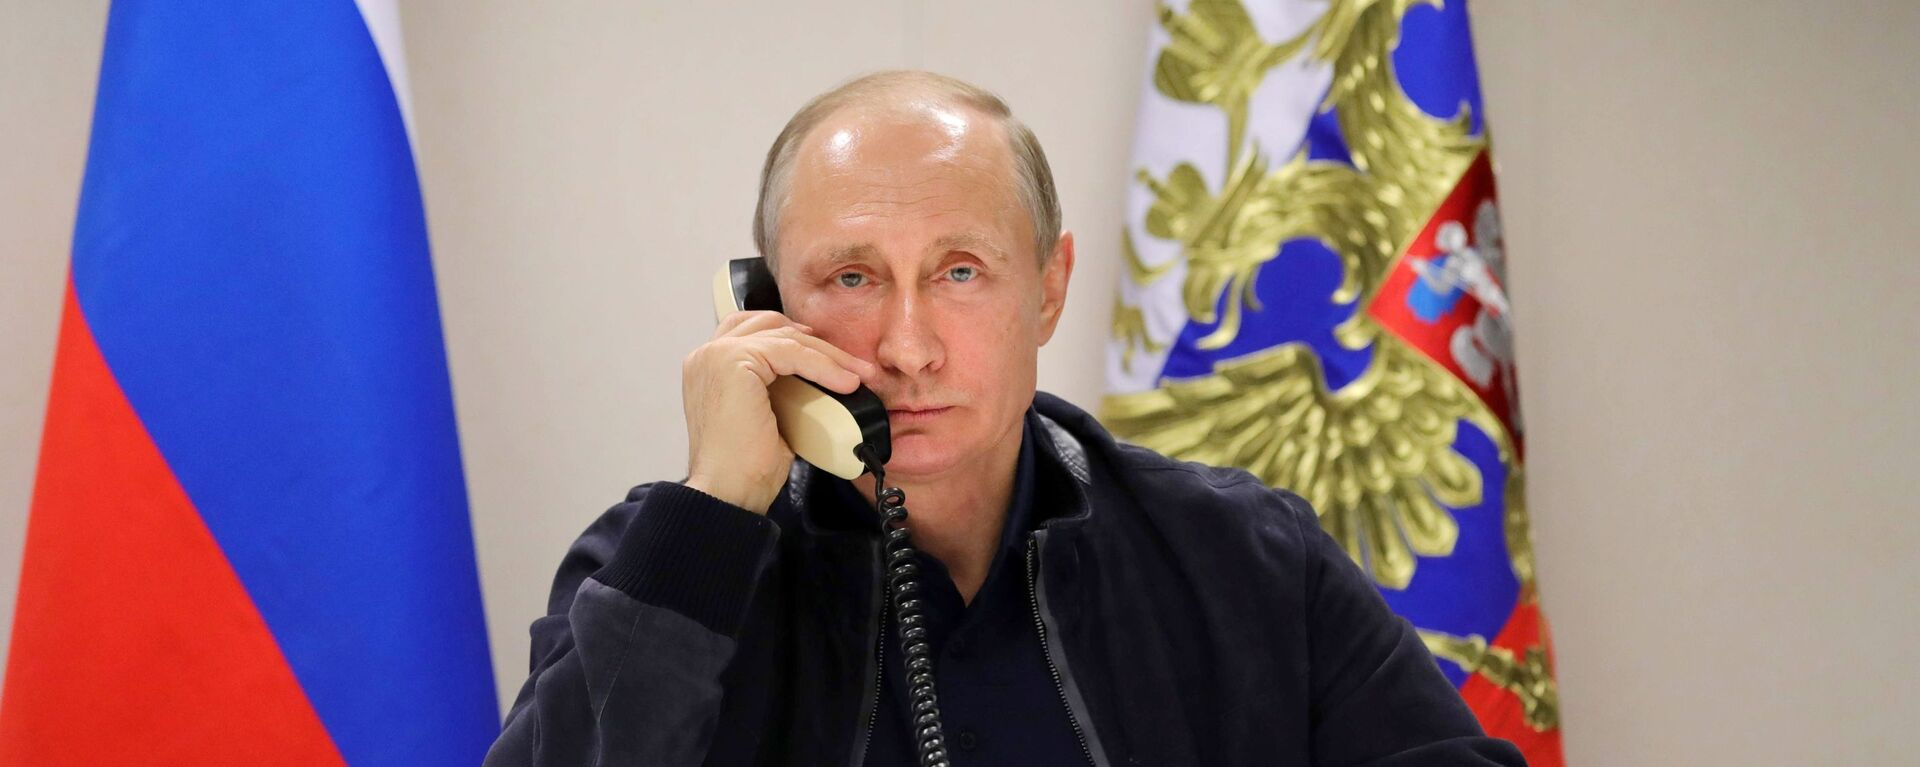 Predsednik Rusije Vladimir Putin tokom telefonskog razgovora sa predsednikom Turske Redžepom Tajipom Erdoganom  - Sputnik Srbija, 1920, 06.04.2021